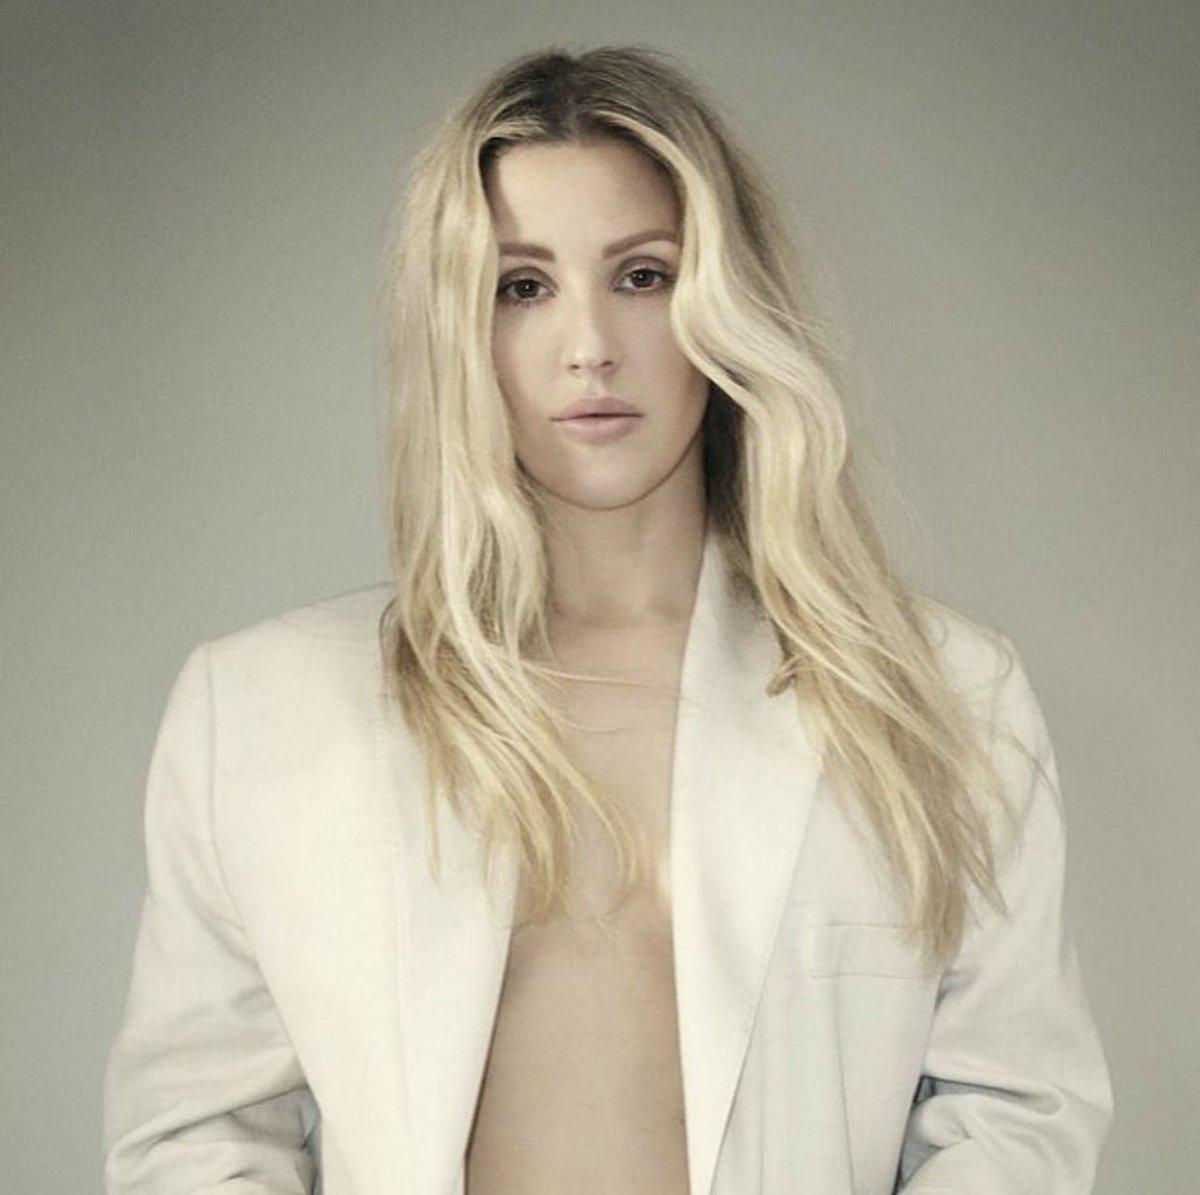 Ellie Goulding photoshoot